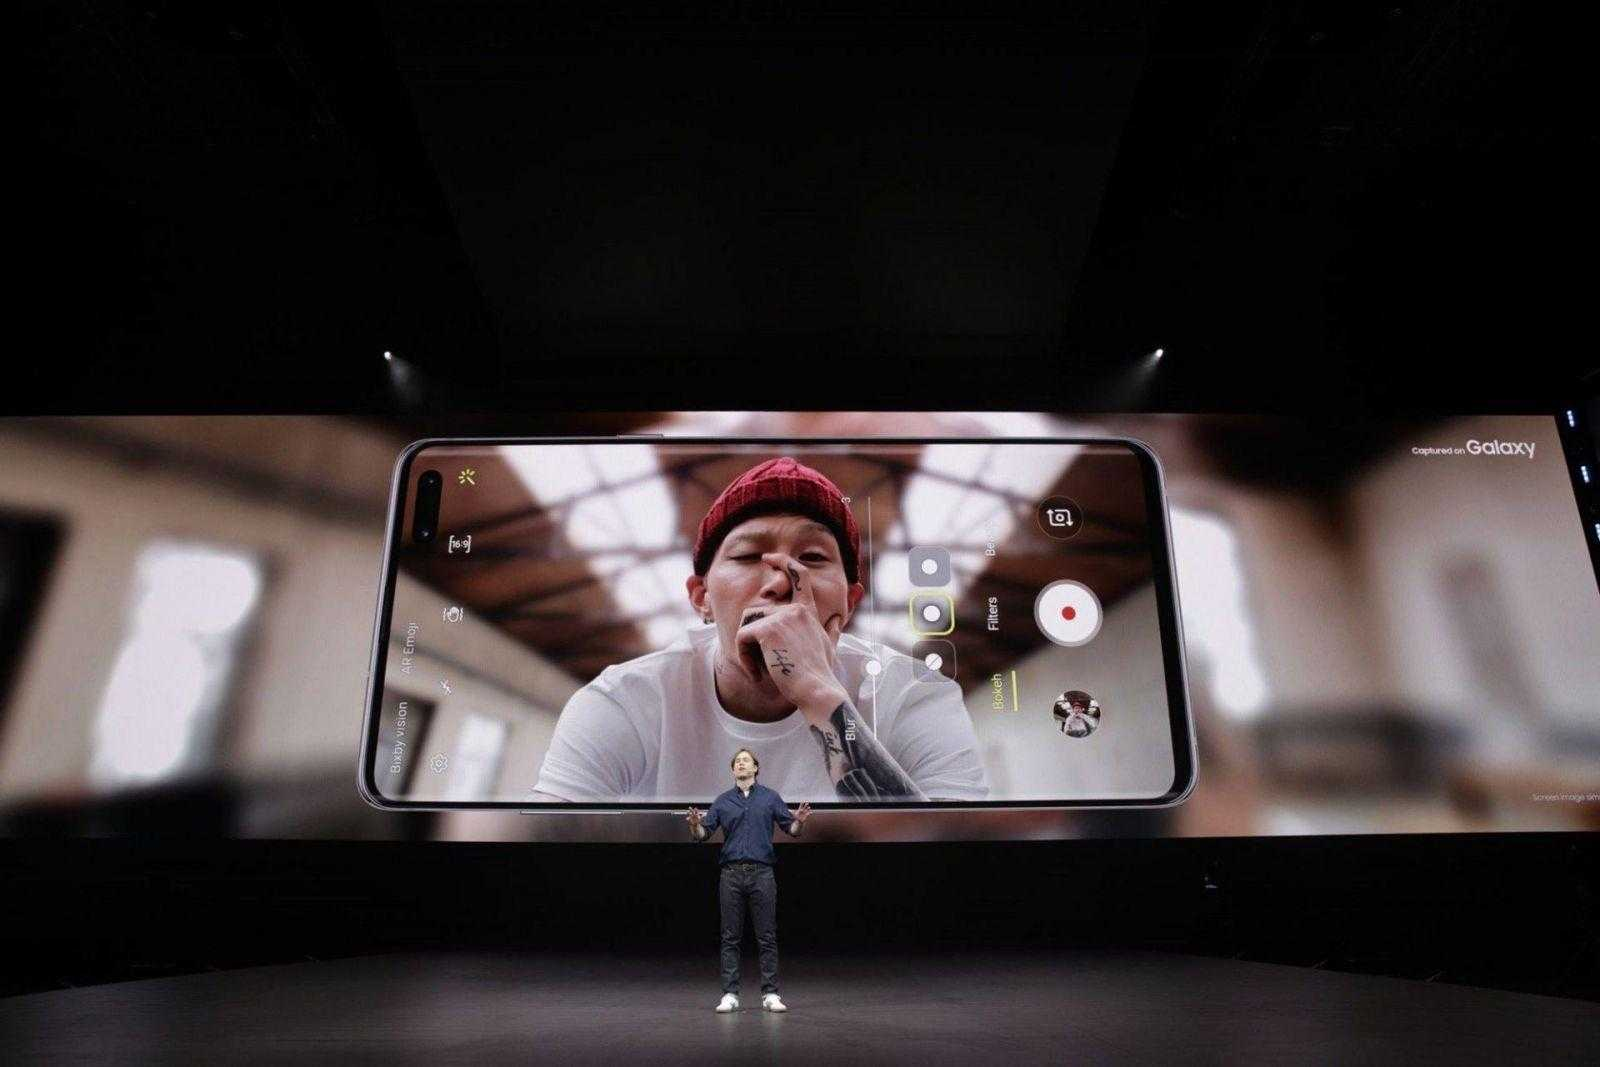 Samsung показал самый мощный смартфон Galaxy S10 5G (lcimg 7839d8af d286 47f5 bae7 f9908537e0c2)